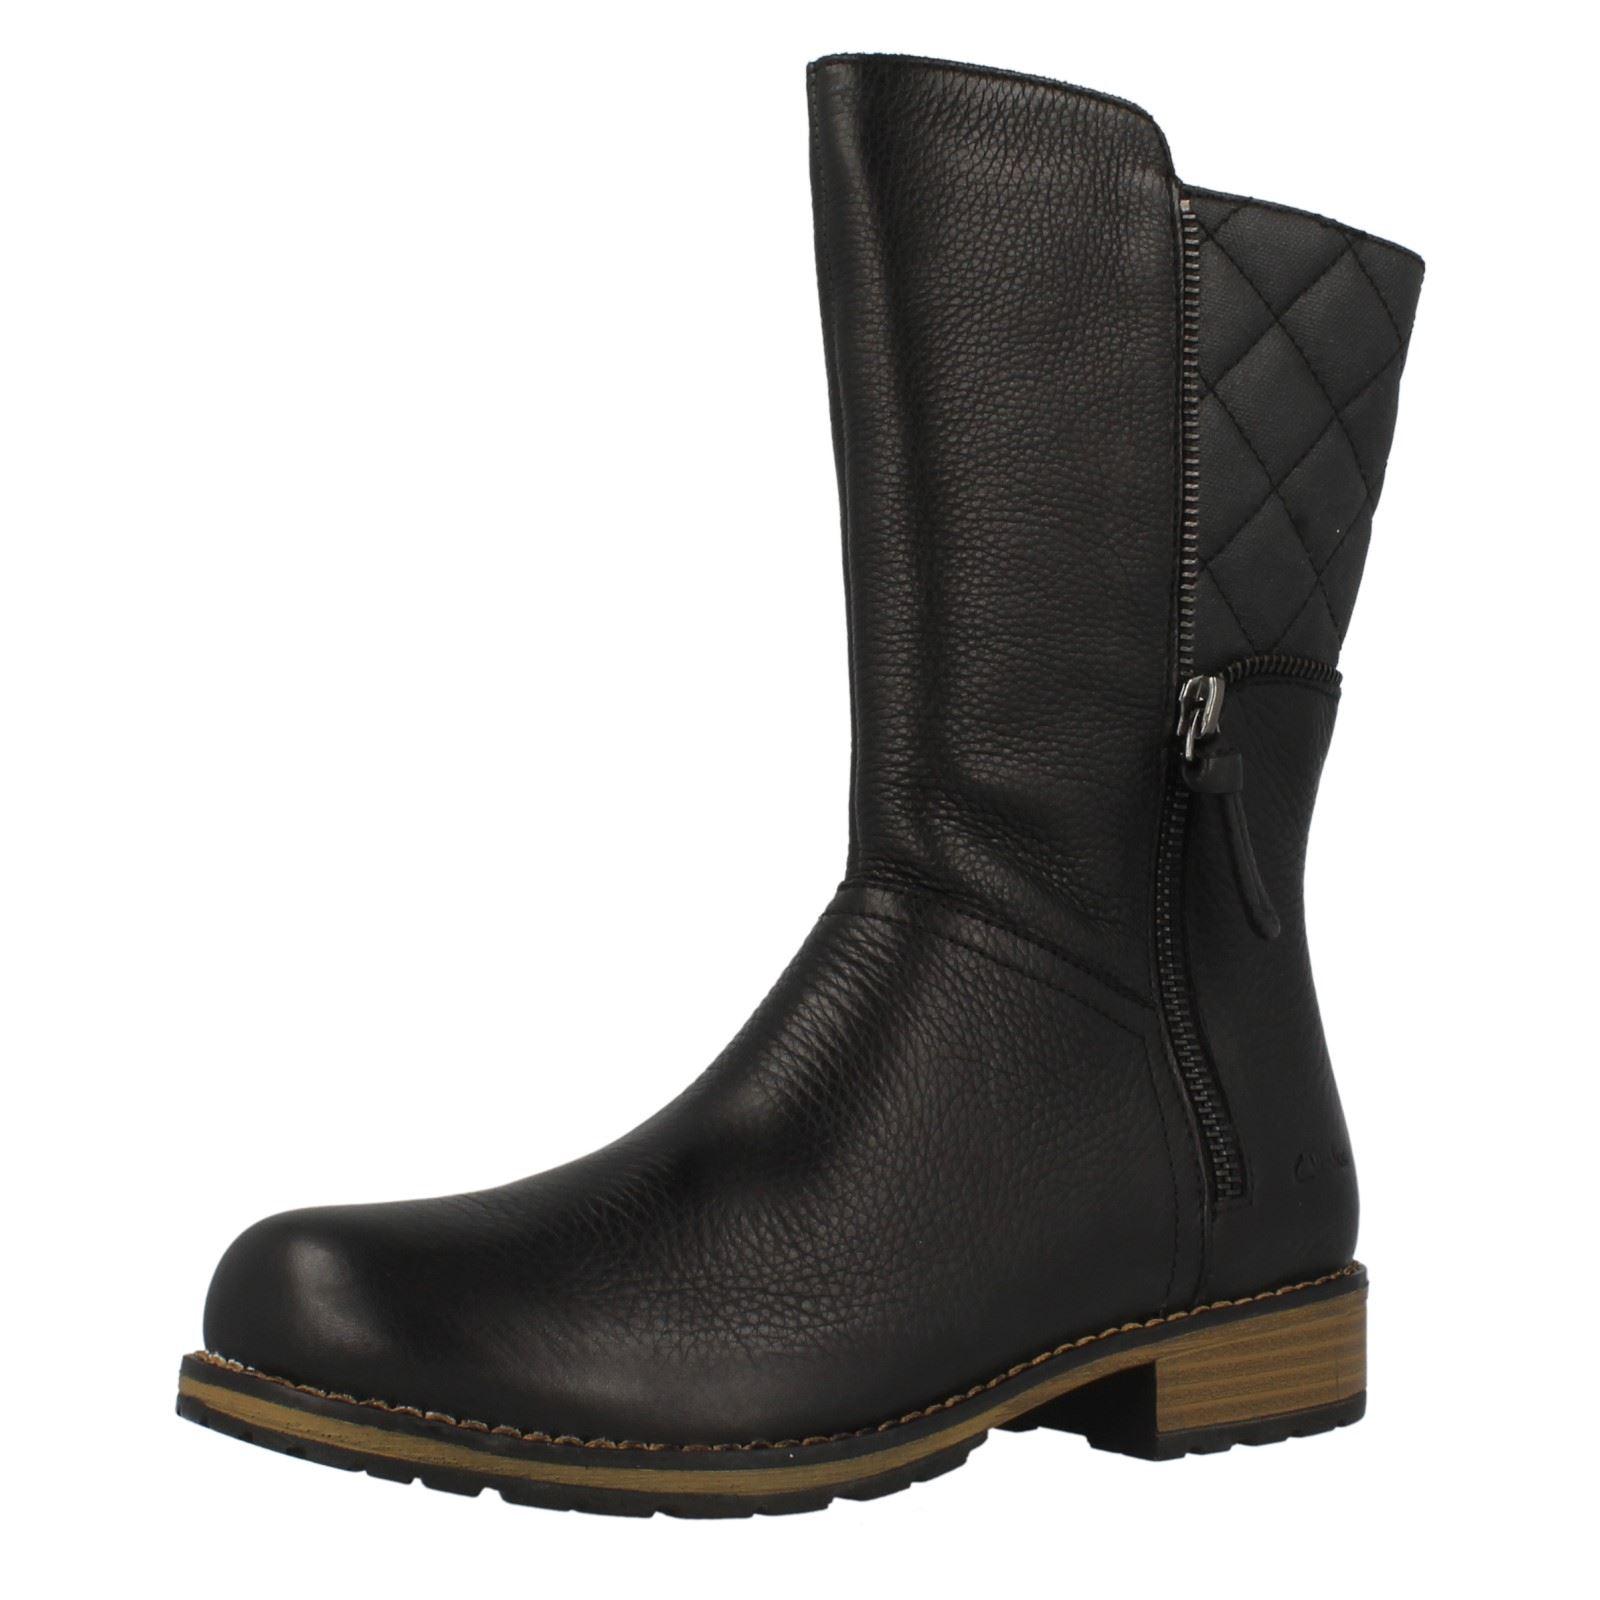 Niñas Black 'kelpie Mid Clarks Heidi' Boots Calf Axpwv4rA